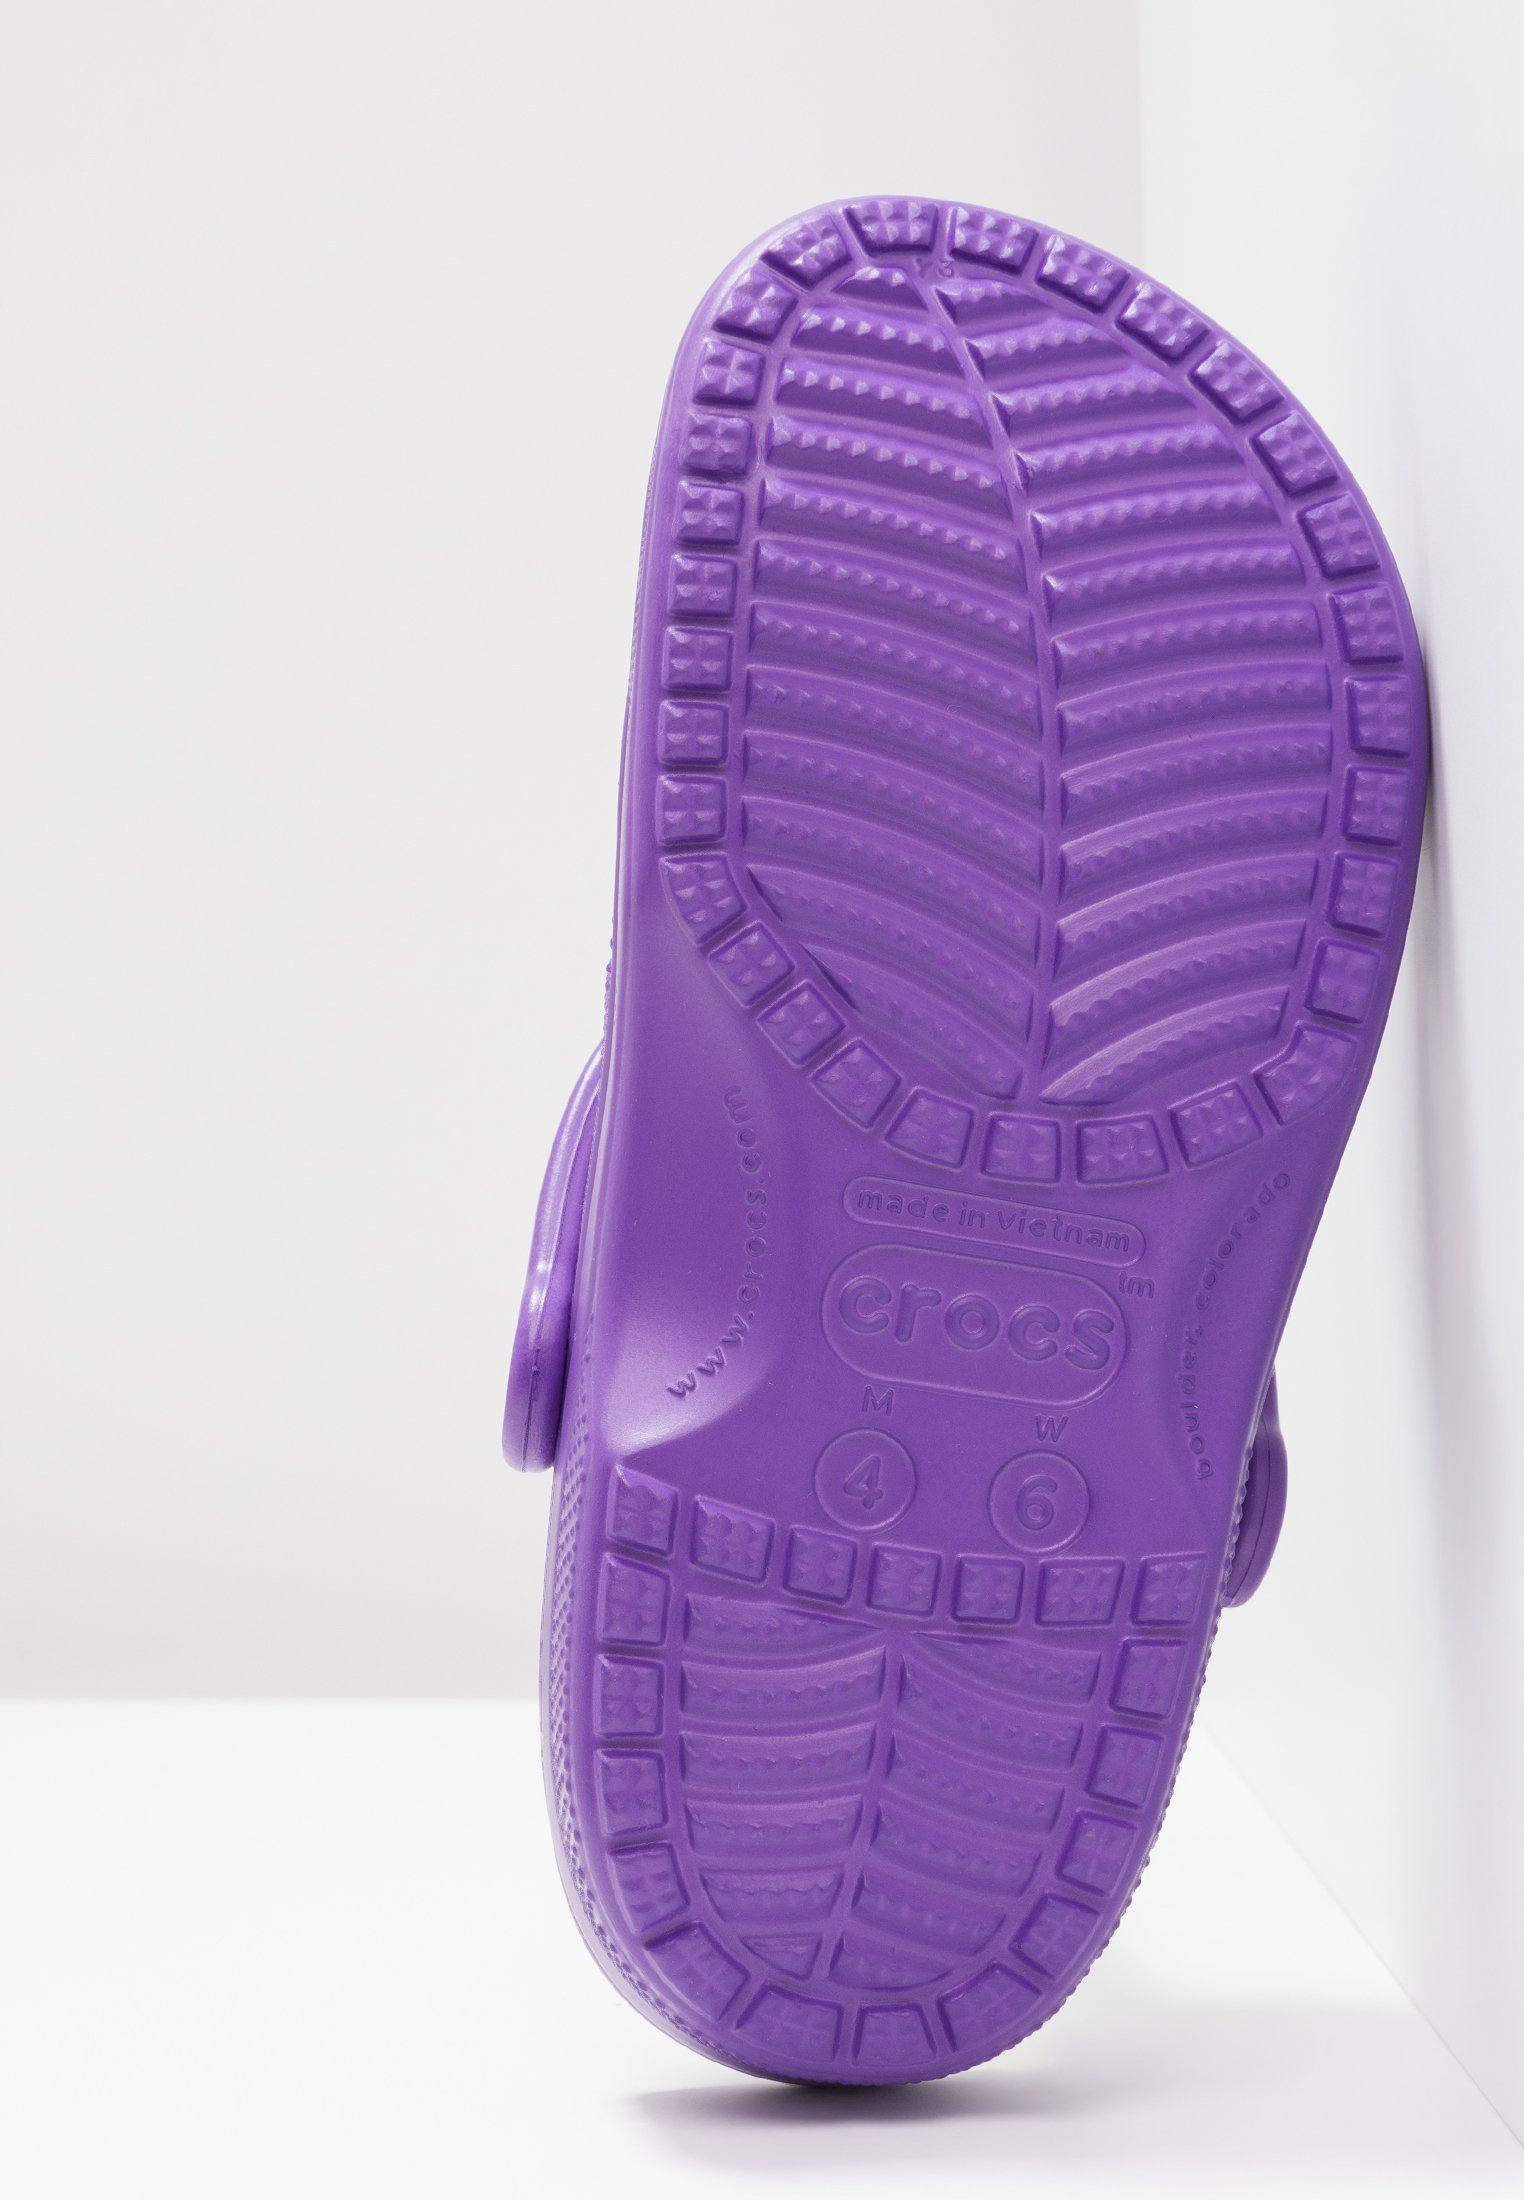 Crocs CLASSIC Hausschuh neon purple/lila